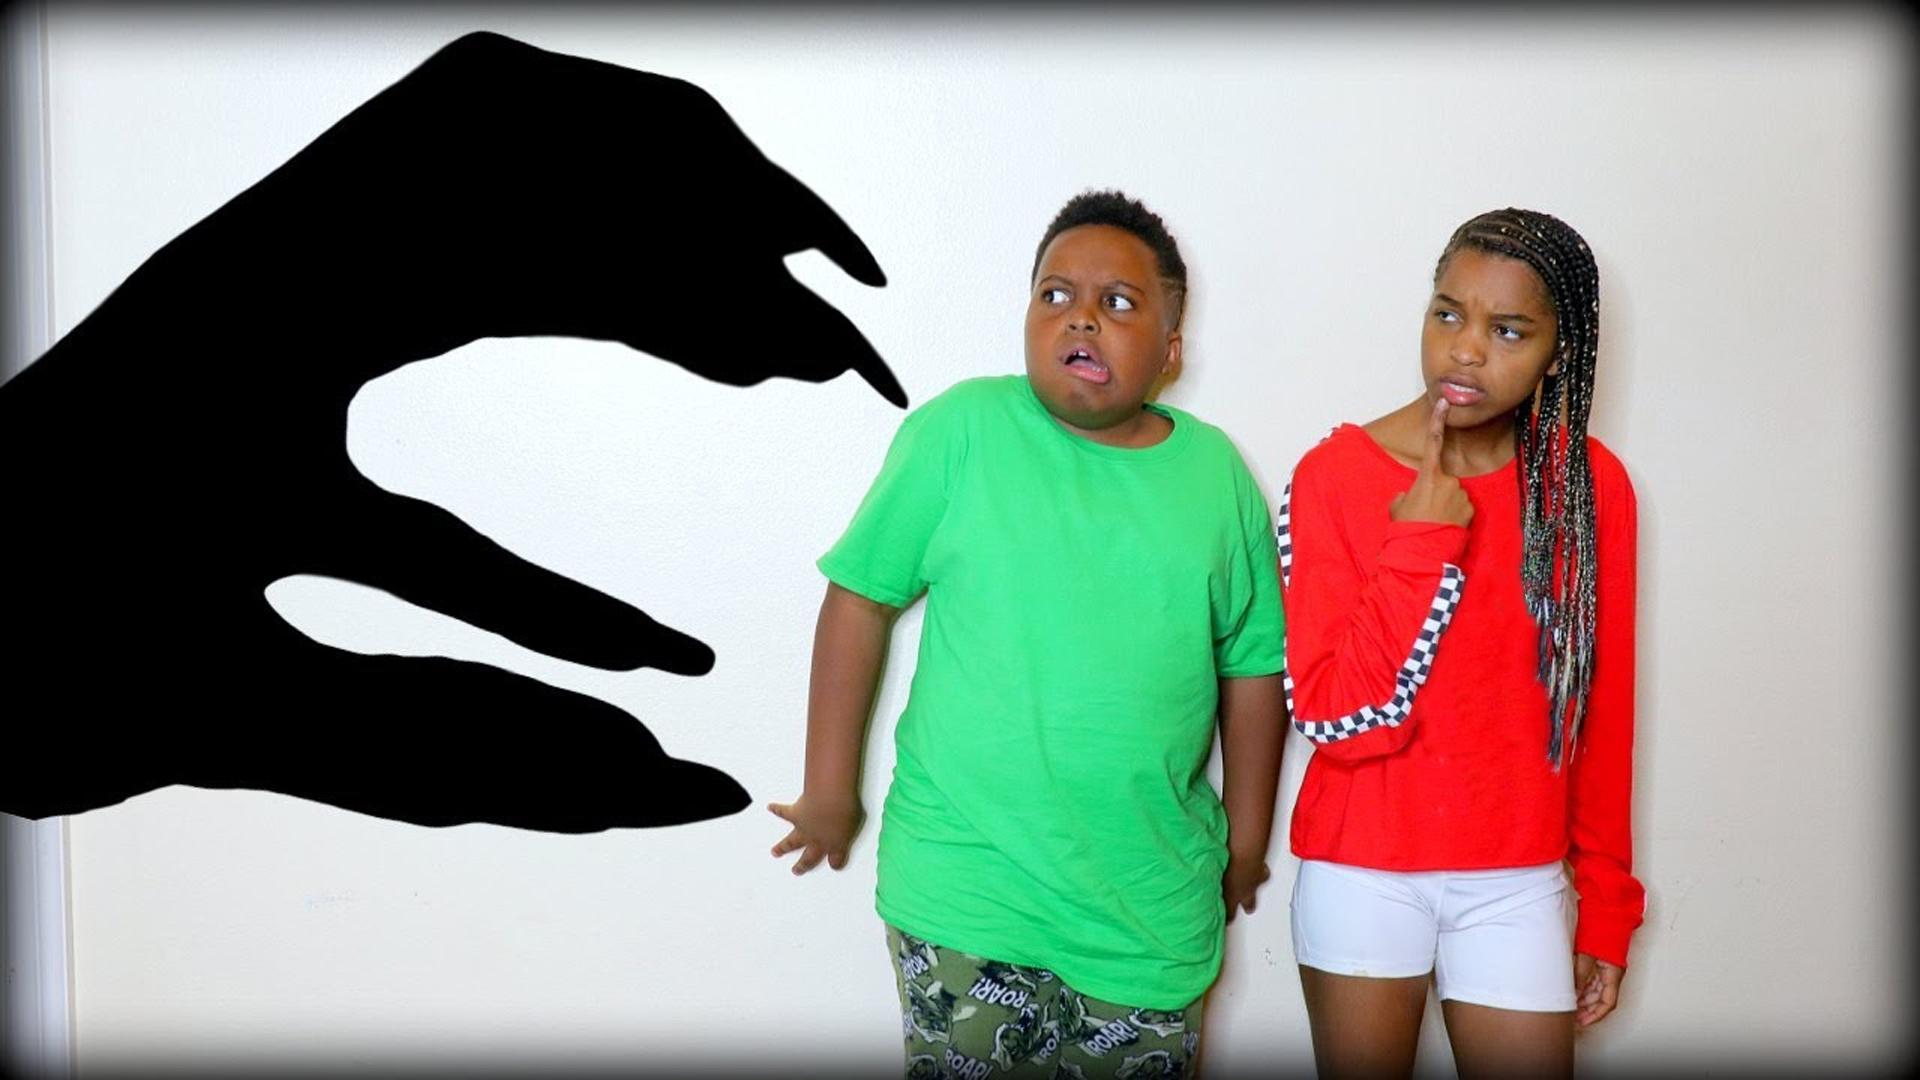 pocket.watch Onyx Family Ultimate mishmash